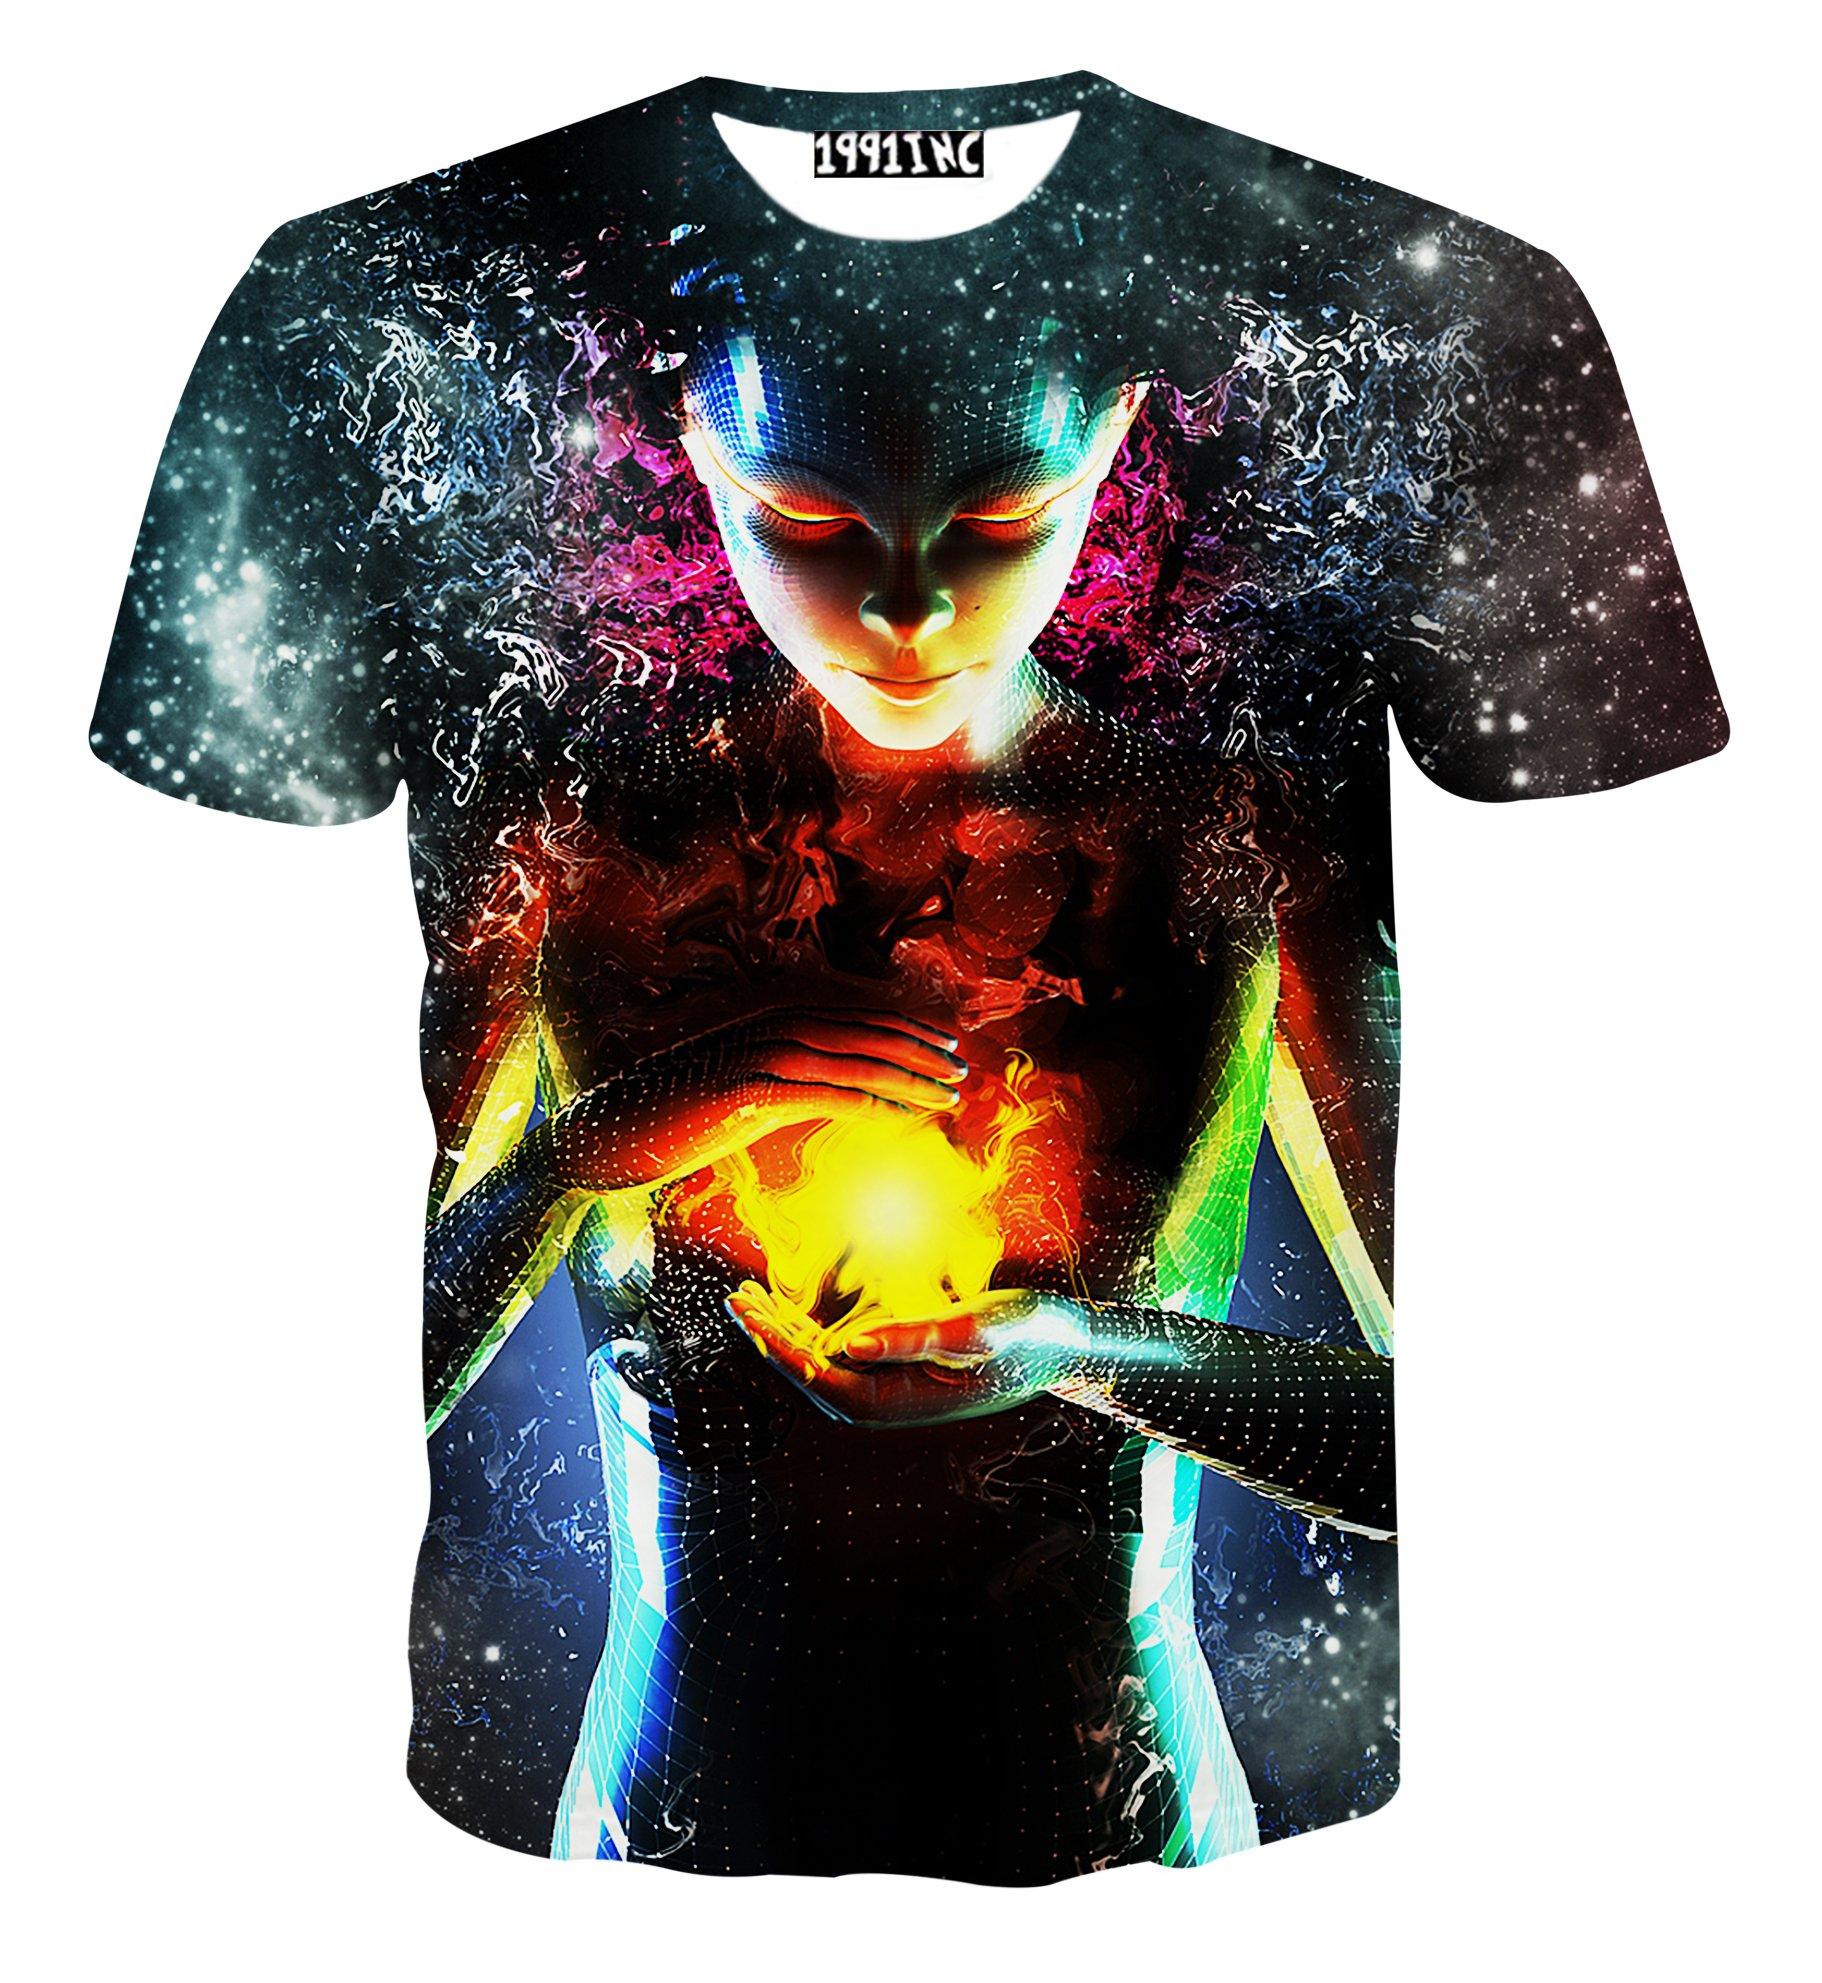 FaPlus Fashion Subject Unreal 3D Print Short-Sleeve Men's T Shirts Digital Design